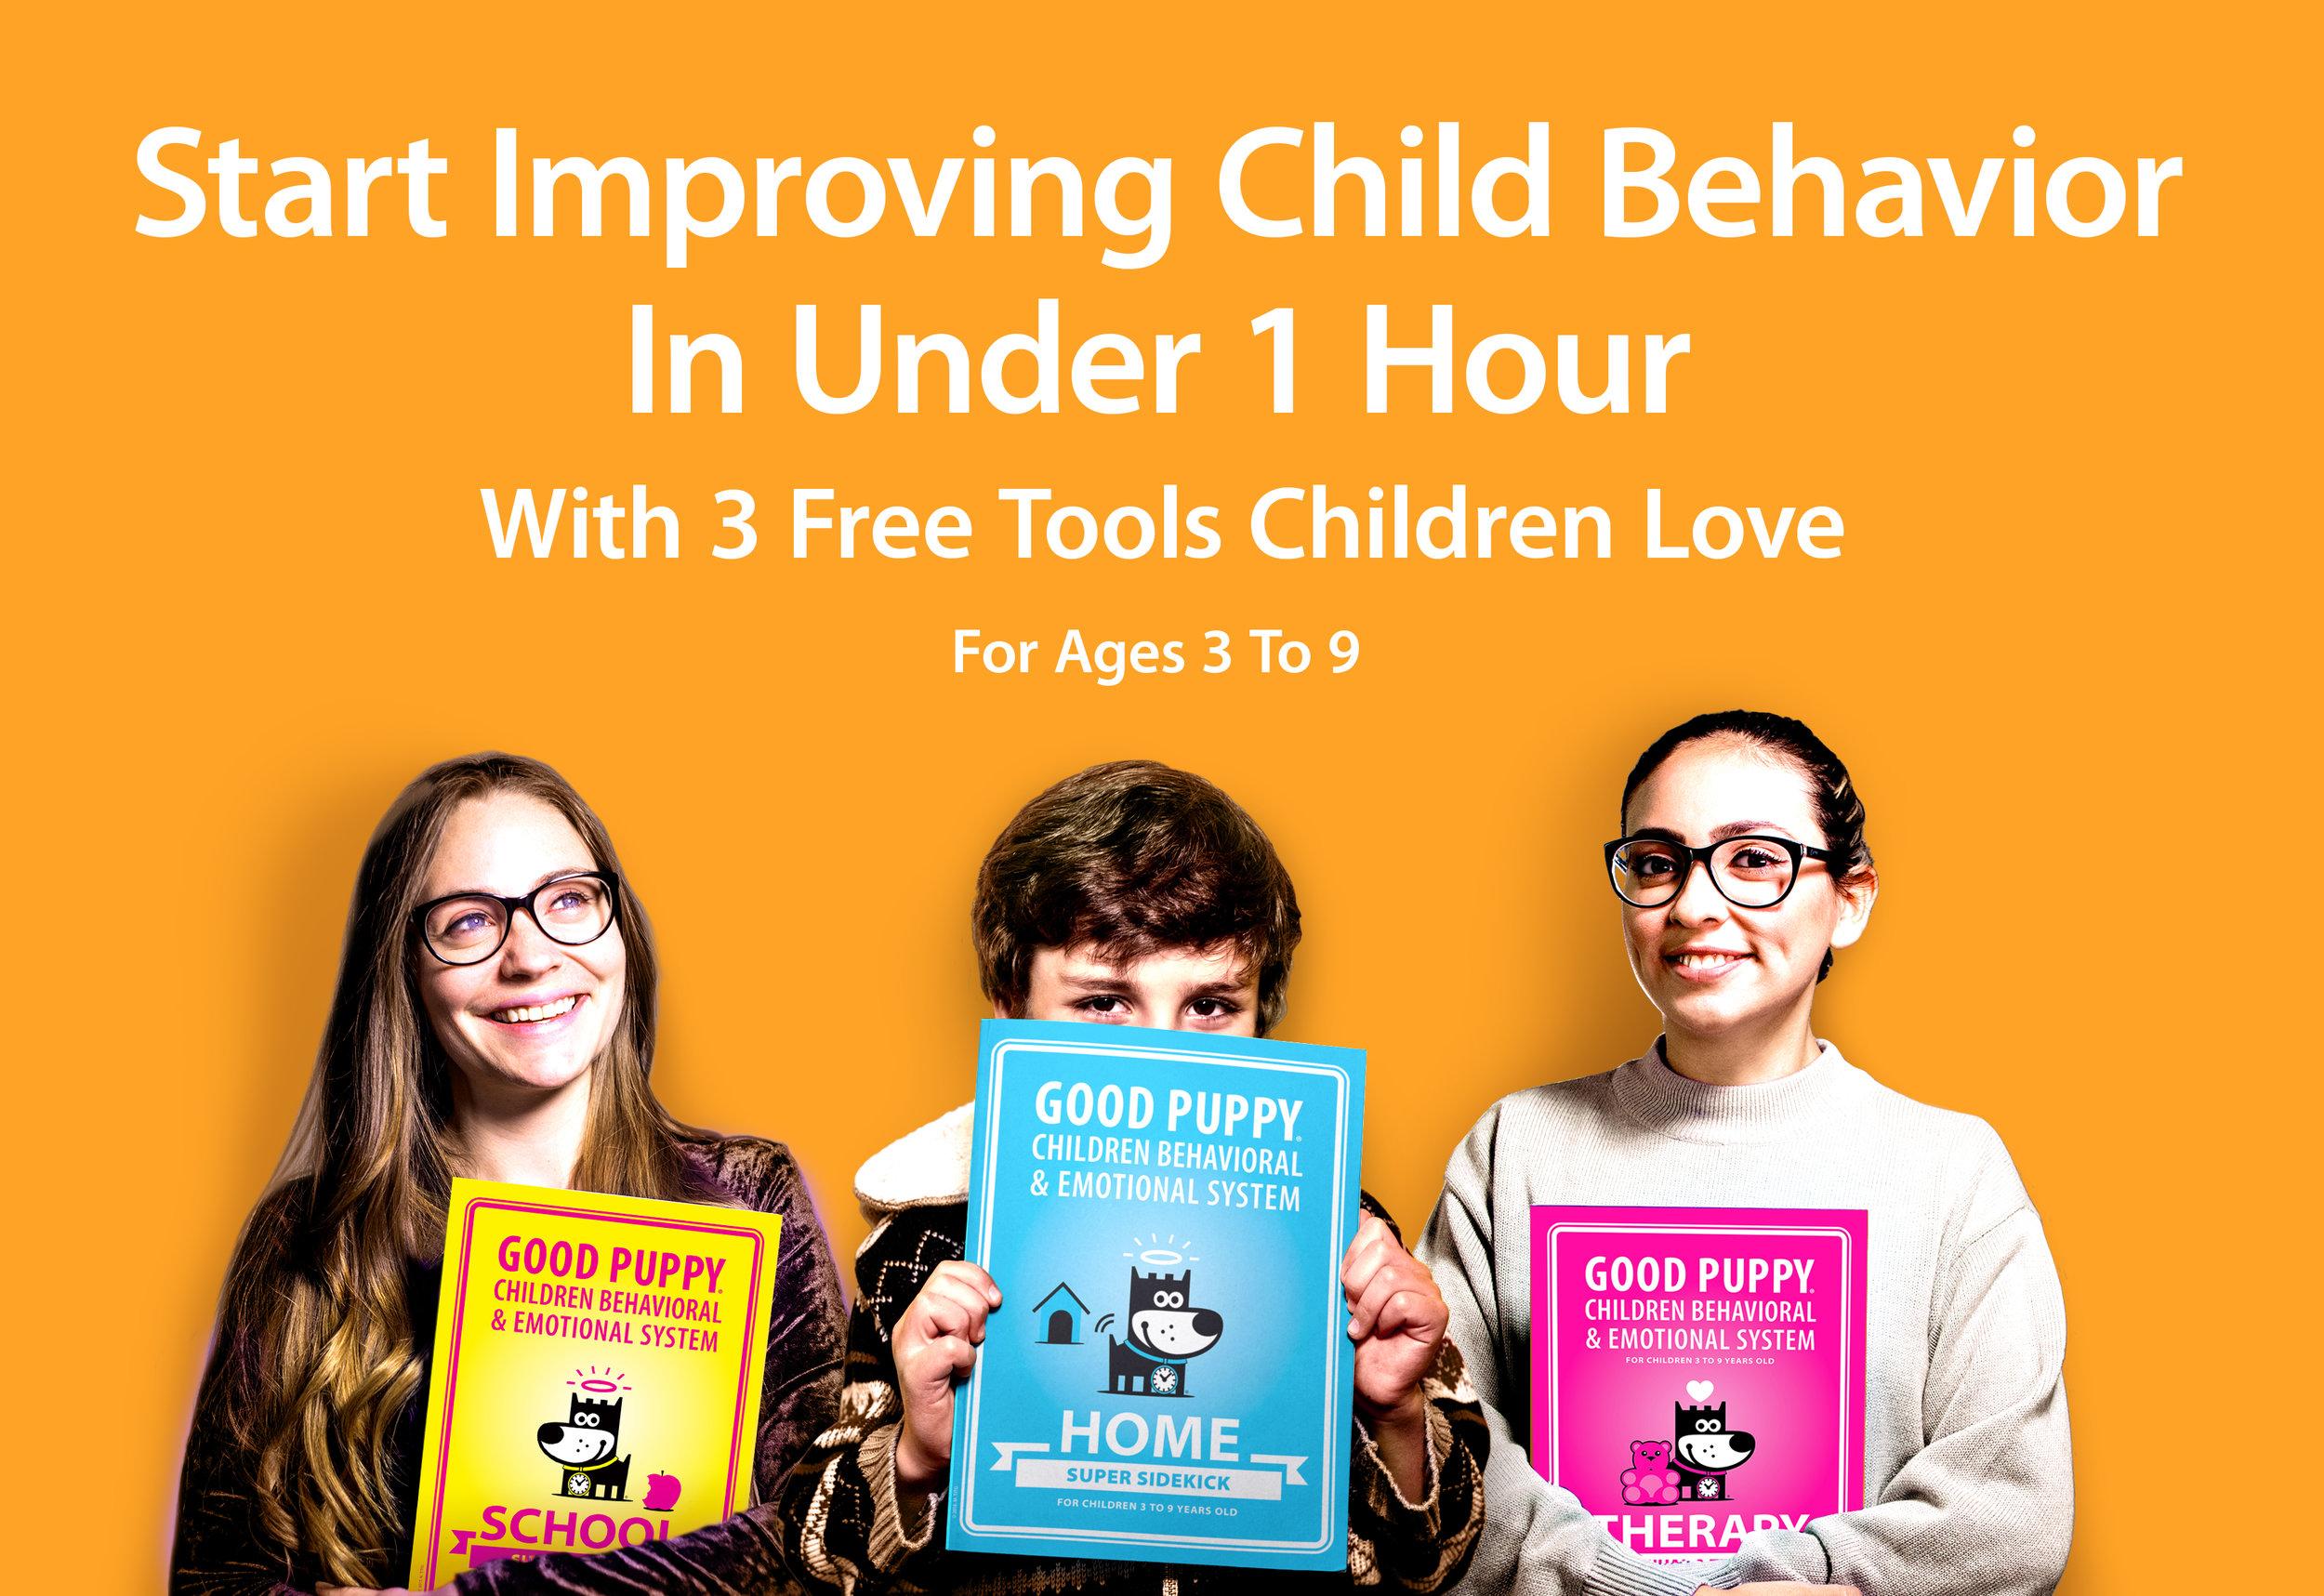 Child-Cognitive-Behavioral-All-Toolkit-G.jpg